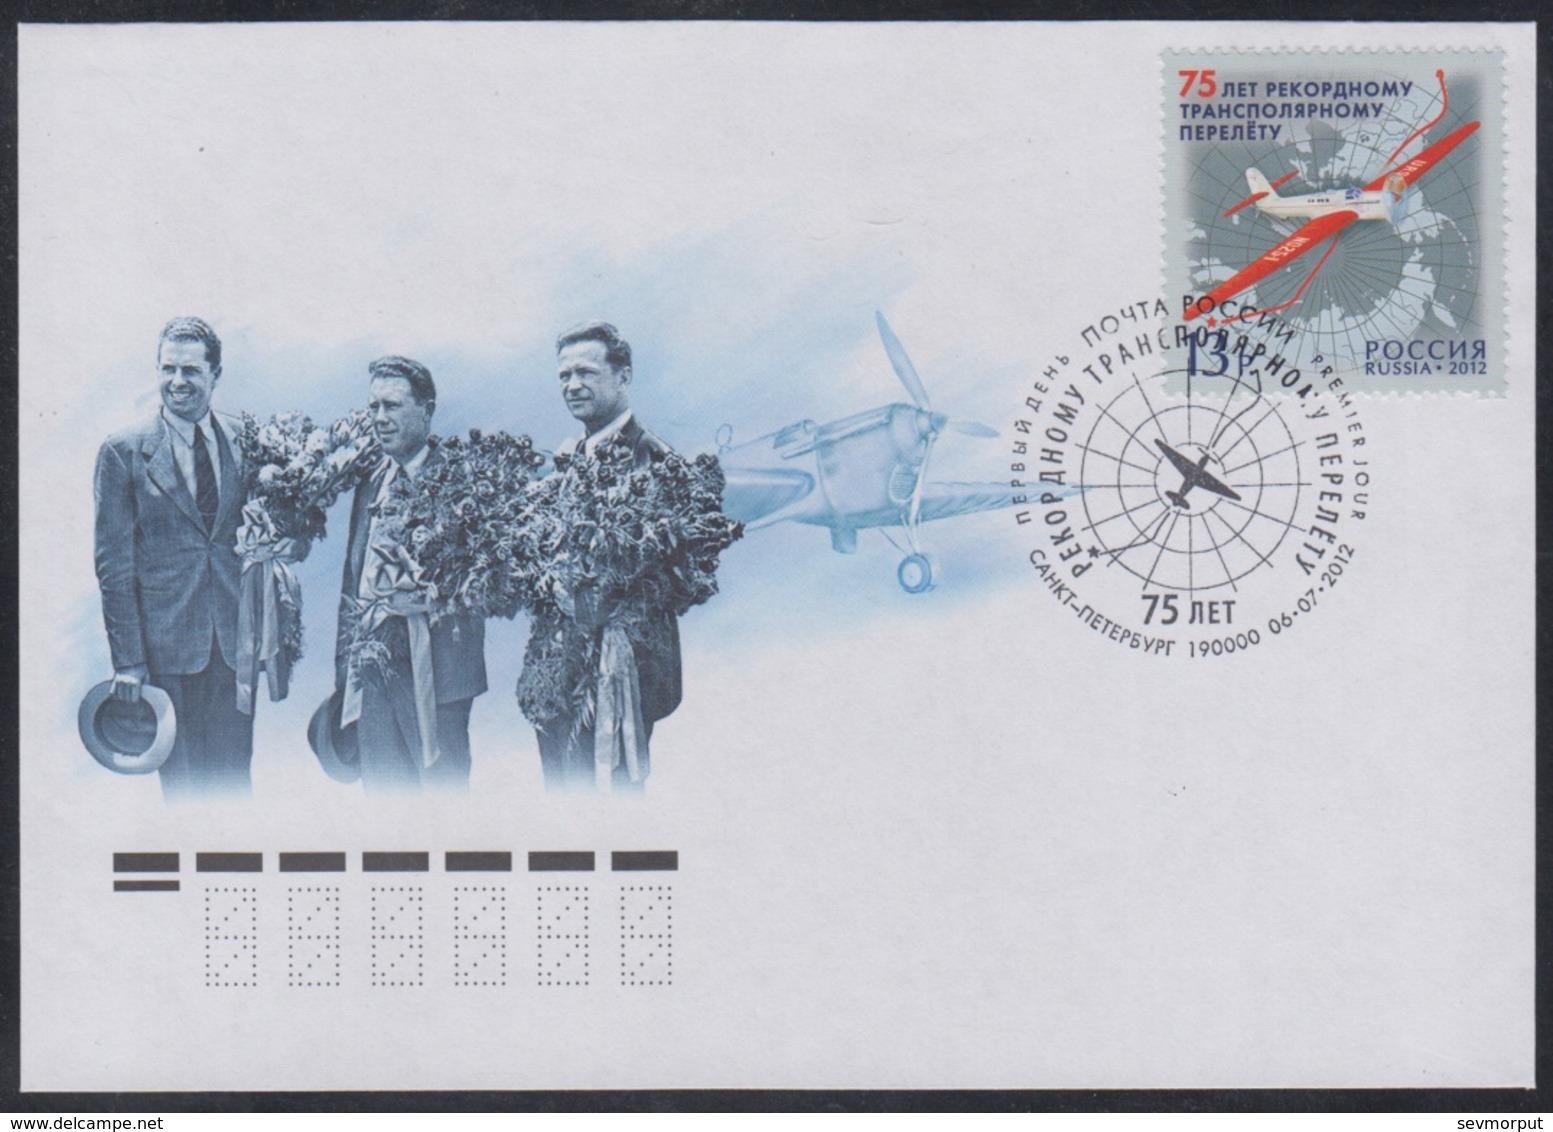 RUSSIA 2012 COVER Used FDC 1698 TRANSPOLAR FLIGHT NORTH POLE ARCTIC AIRPLANE GROMOV YUMASHEV DANILIN PILOT FLYER 1607 - Polar Flights